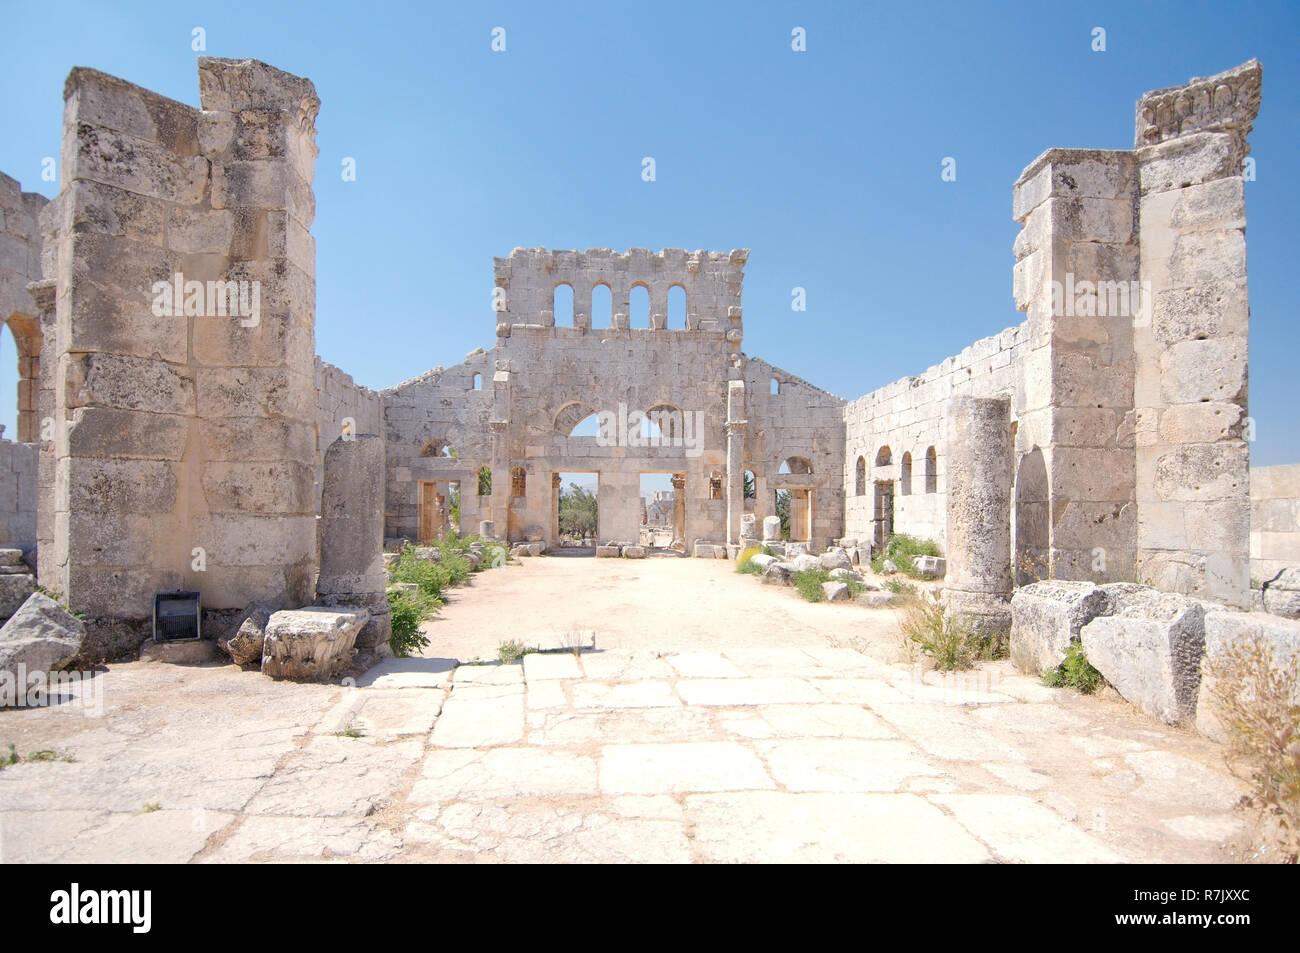 Ruins of the Church of Saint Simeon Stylites, near Aleppo, Syria - Stock Image